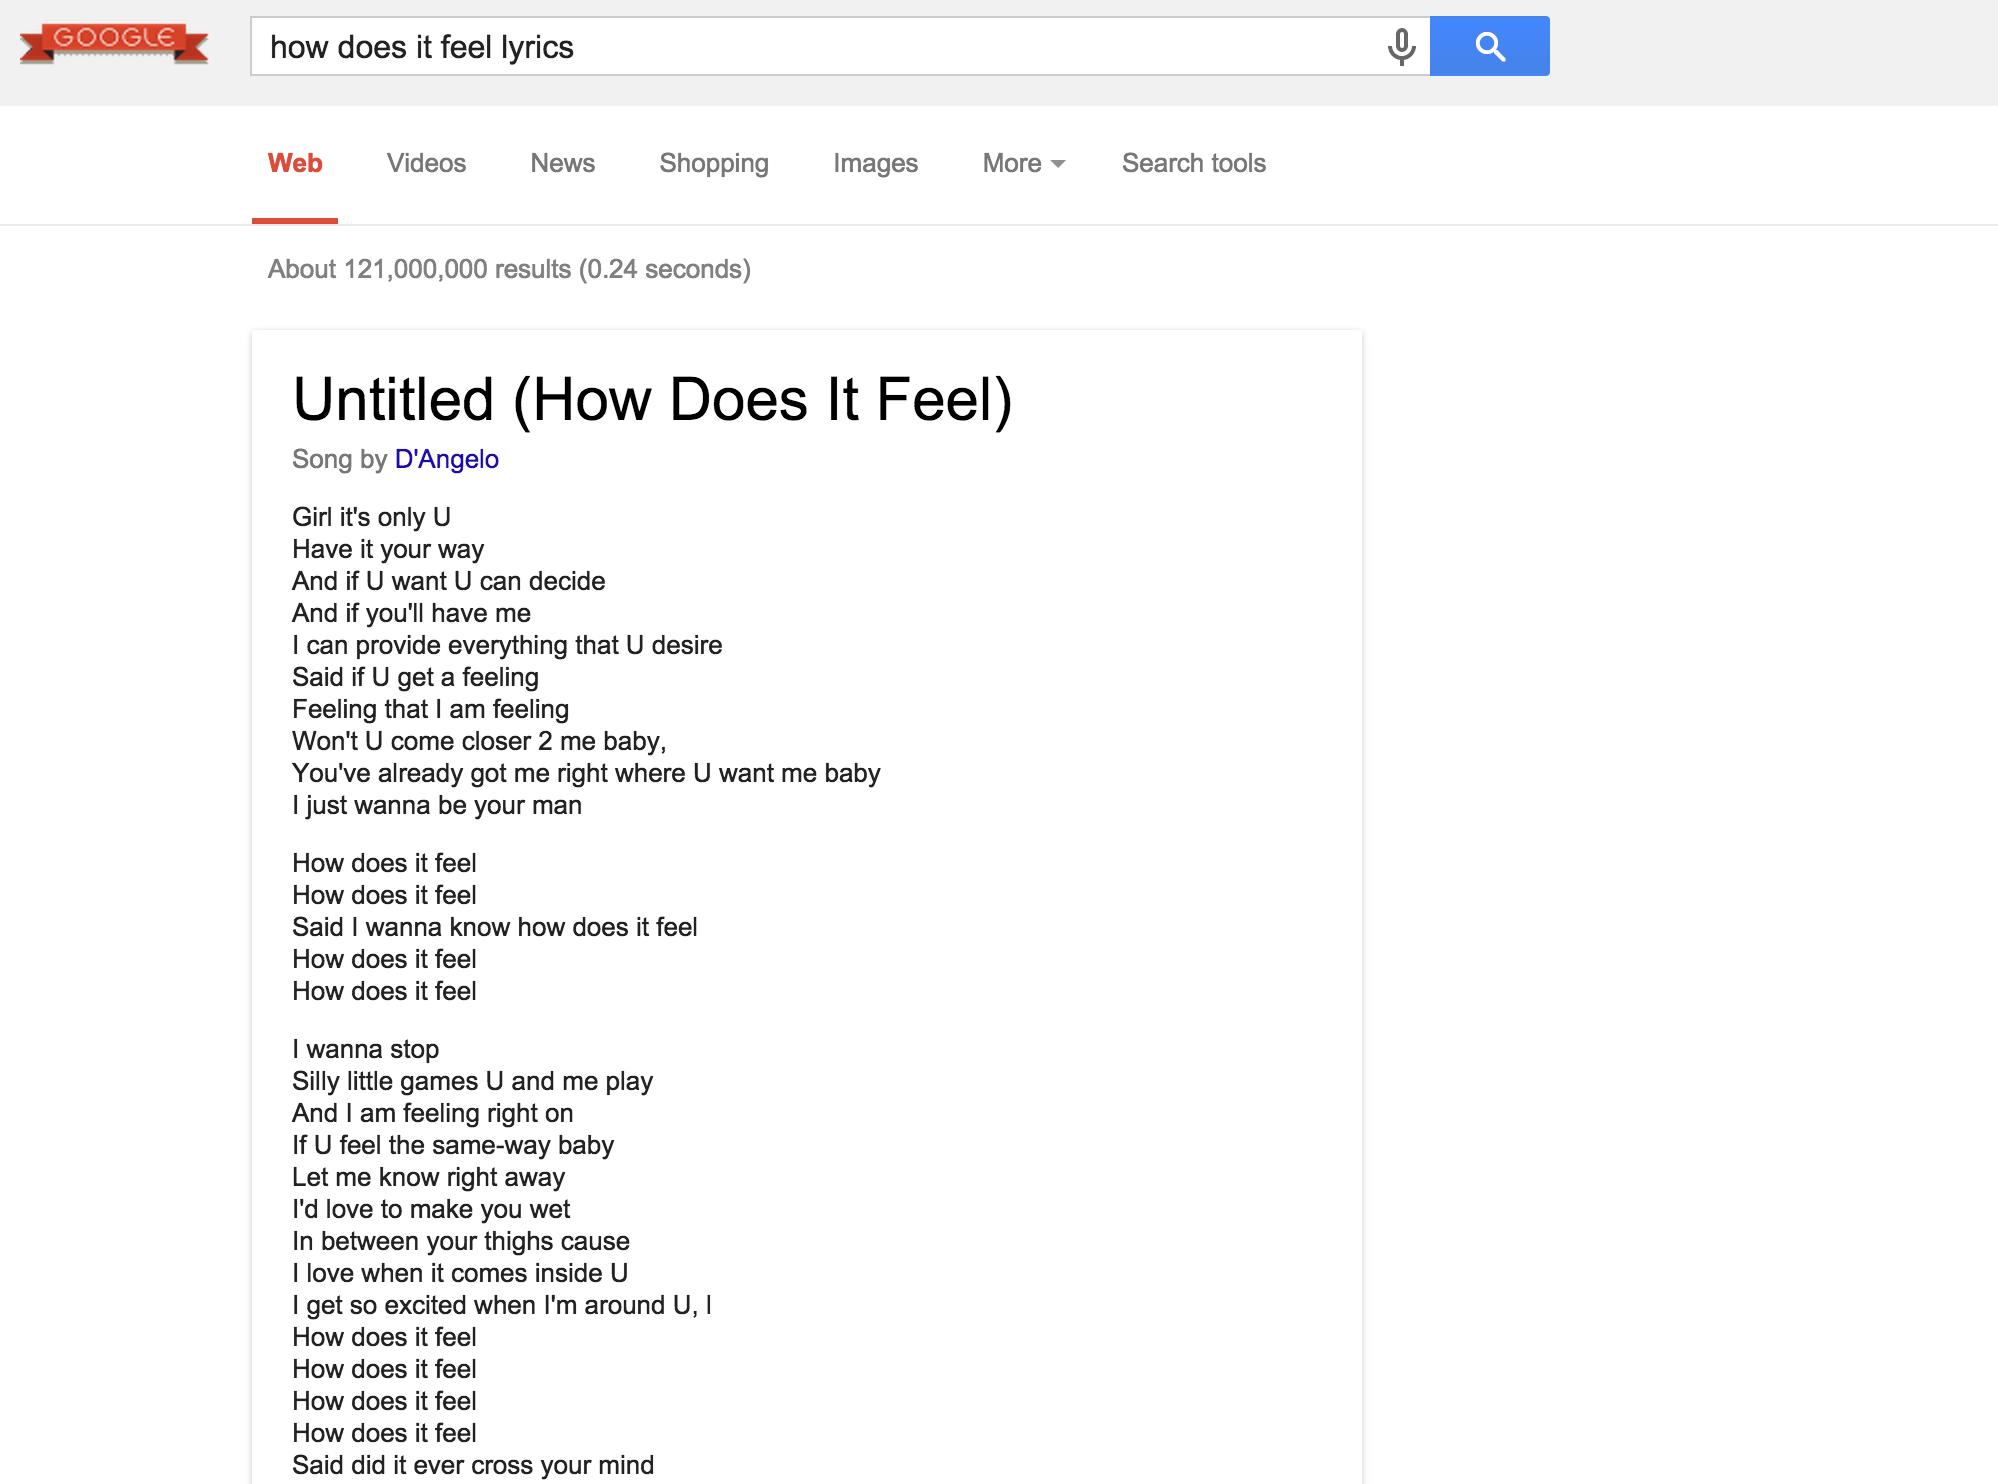 Google lyrics displays D'Angelo's  How Does it Feel